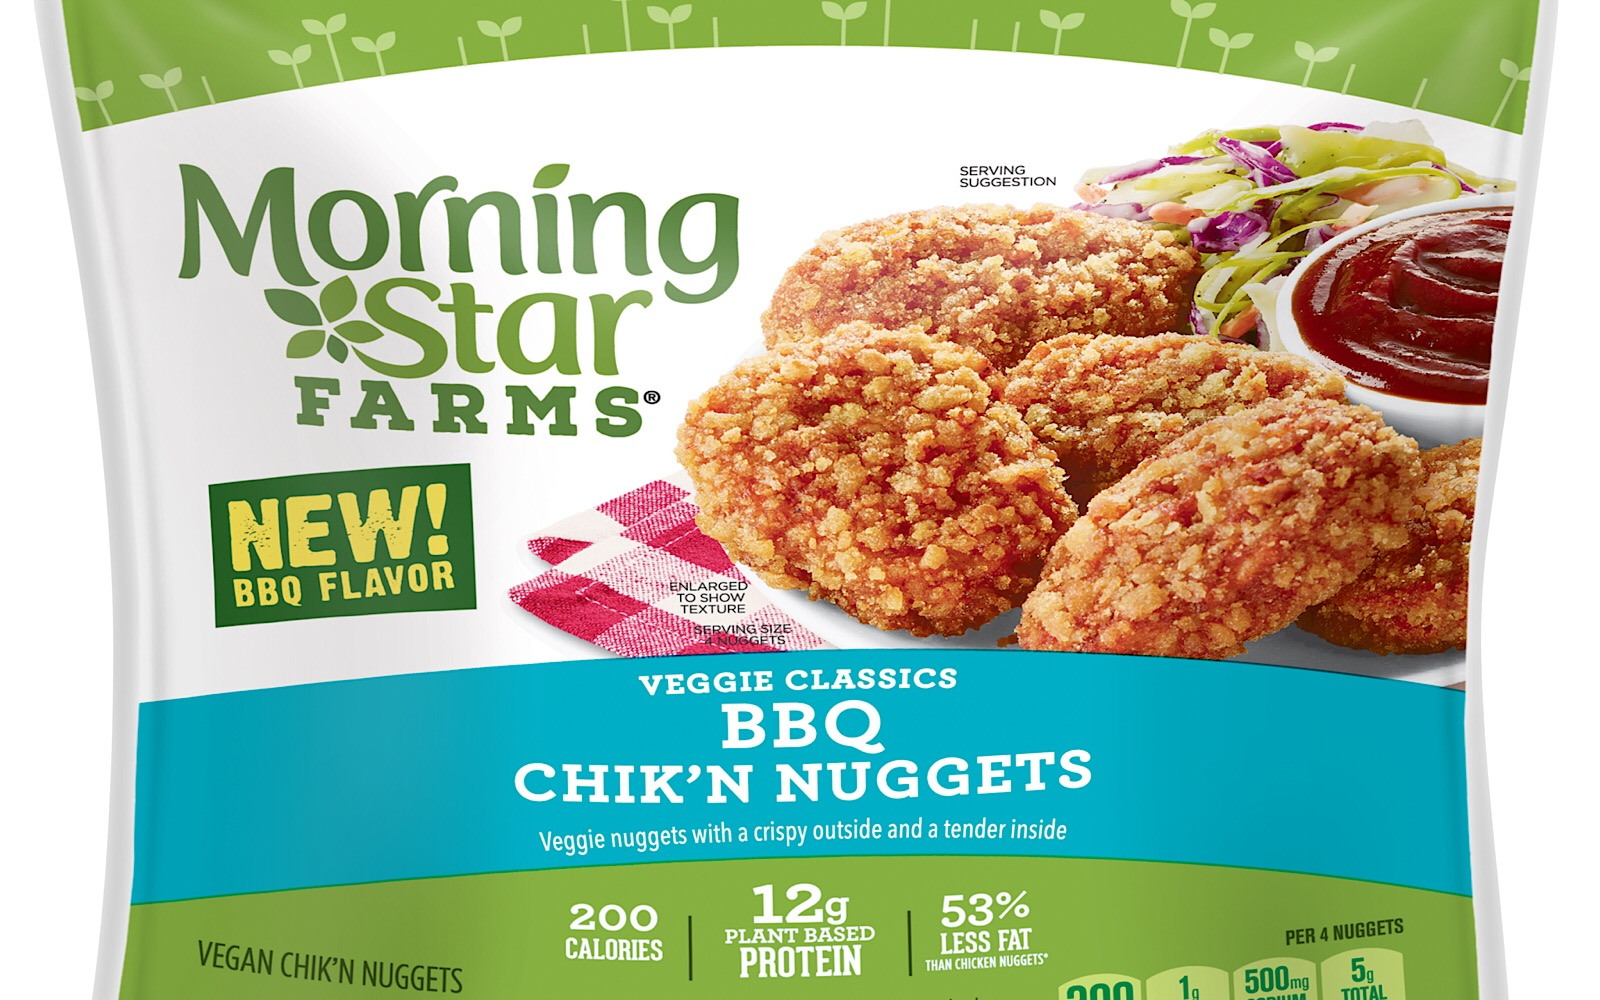 Morning star farms vegan nuggets